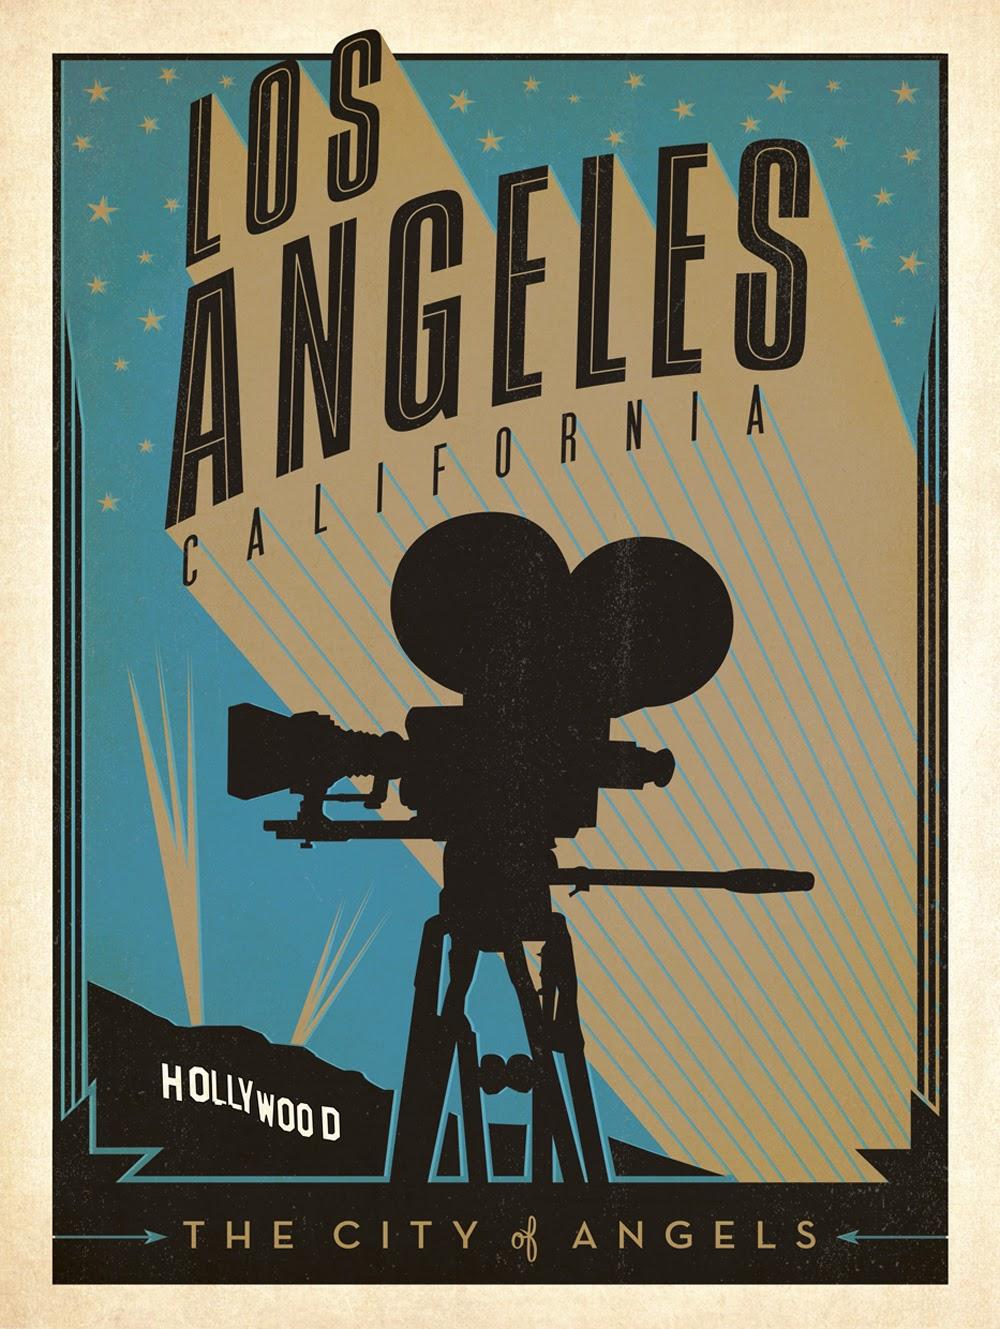 ART  ARTISTS Vintage Travel Posters Part - Los angeles posters vintage